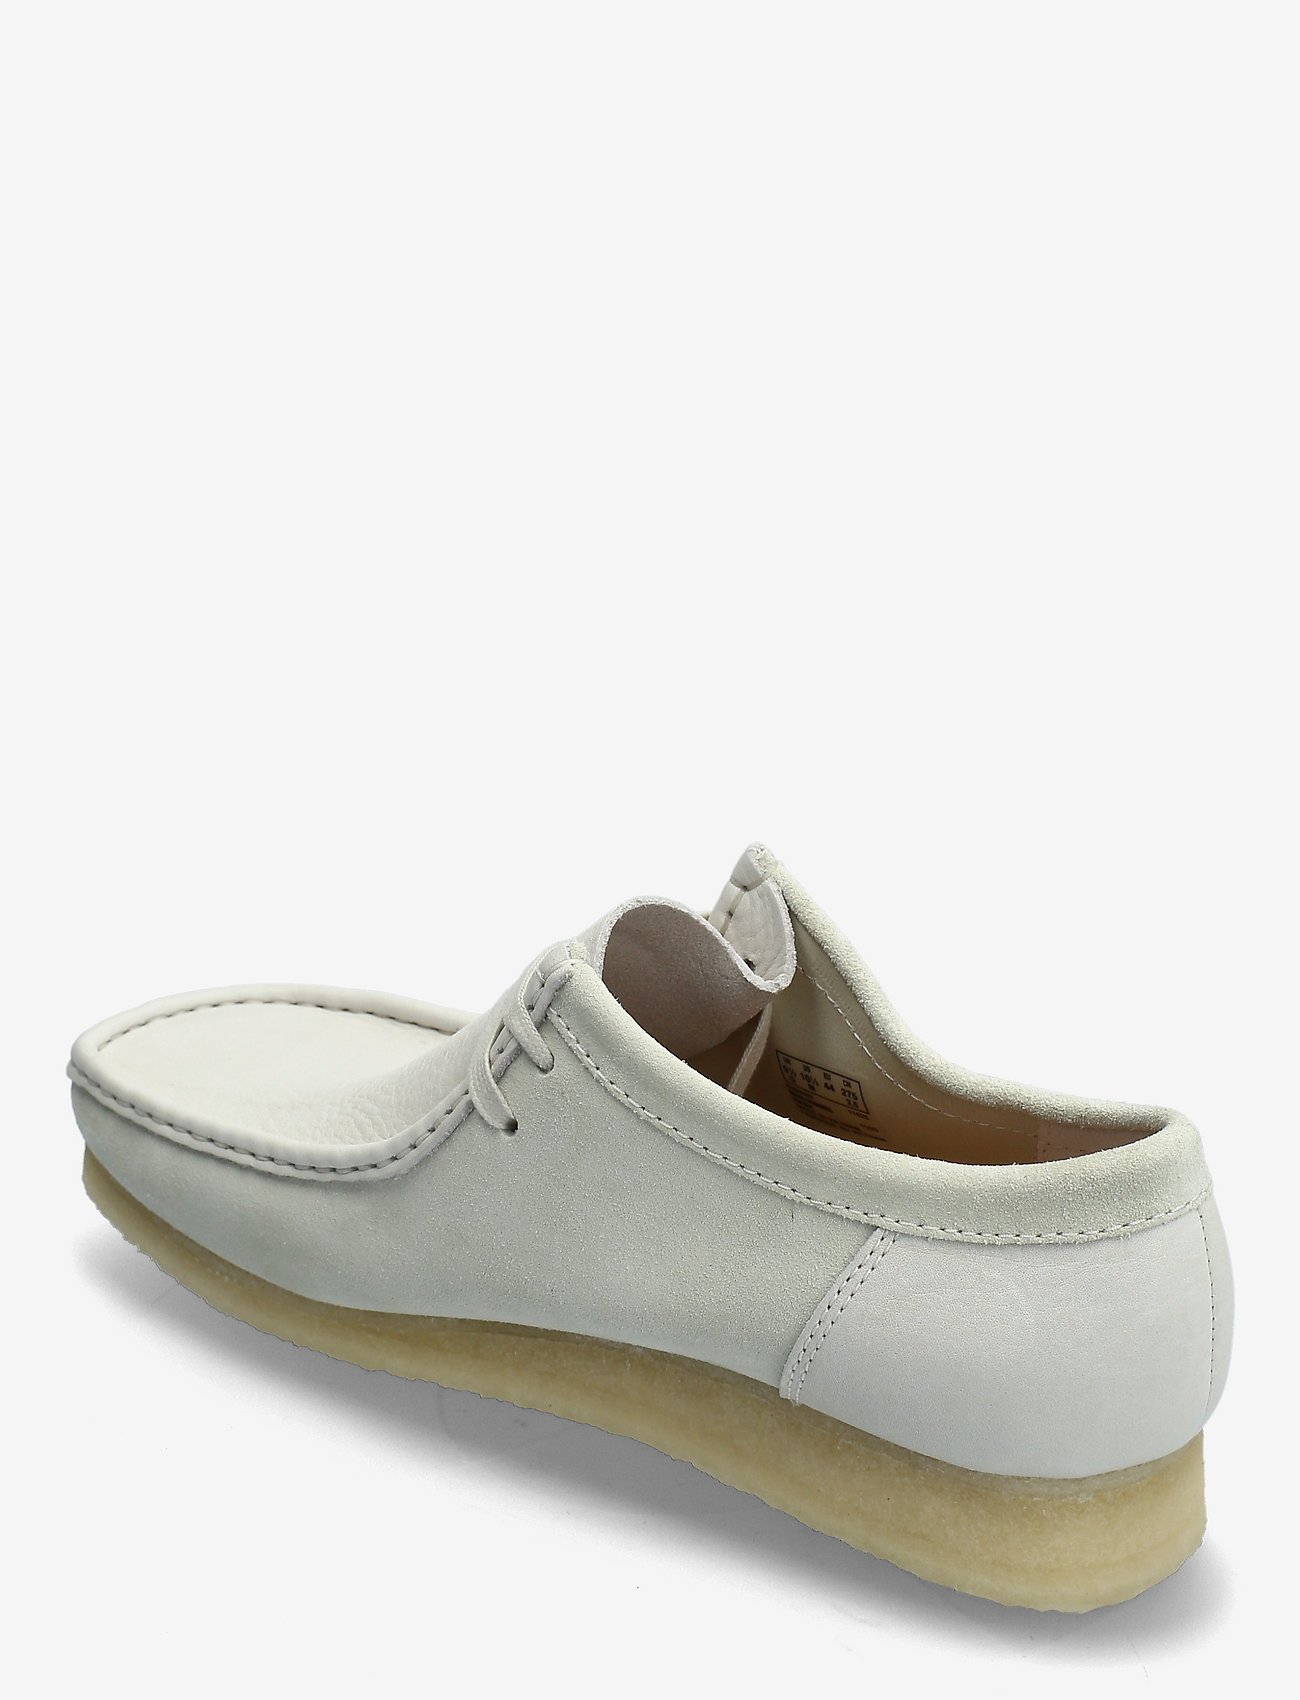 Clarks Originals - Wallabee 2CLR - skor - white combi - 2